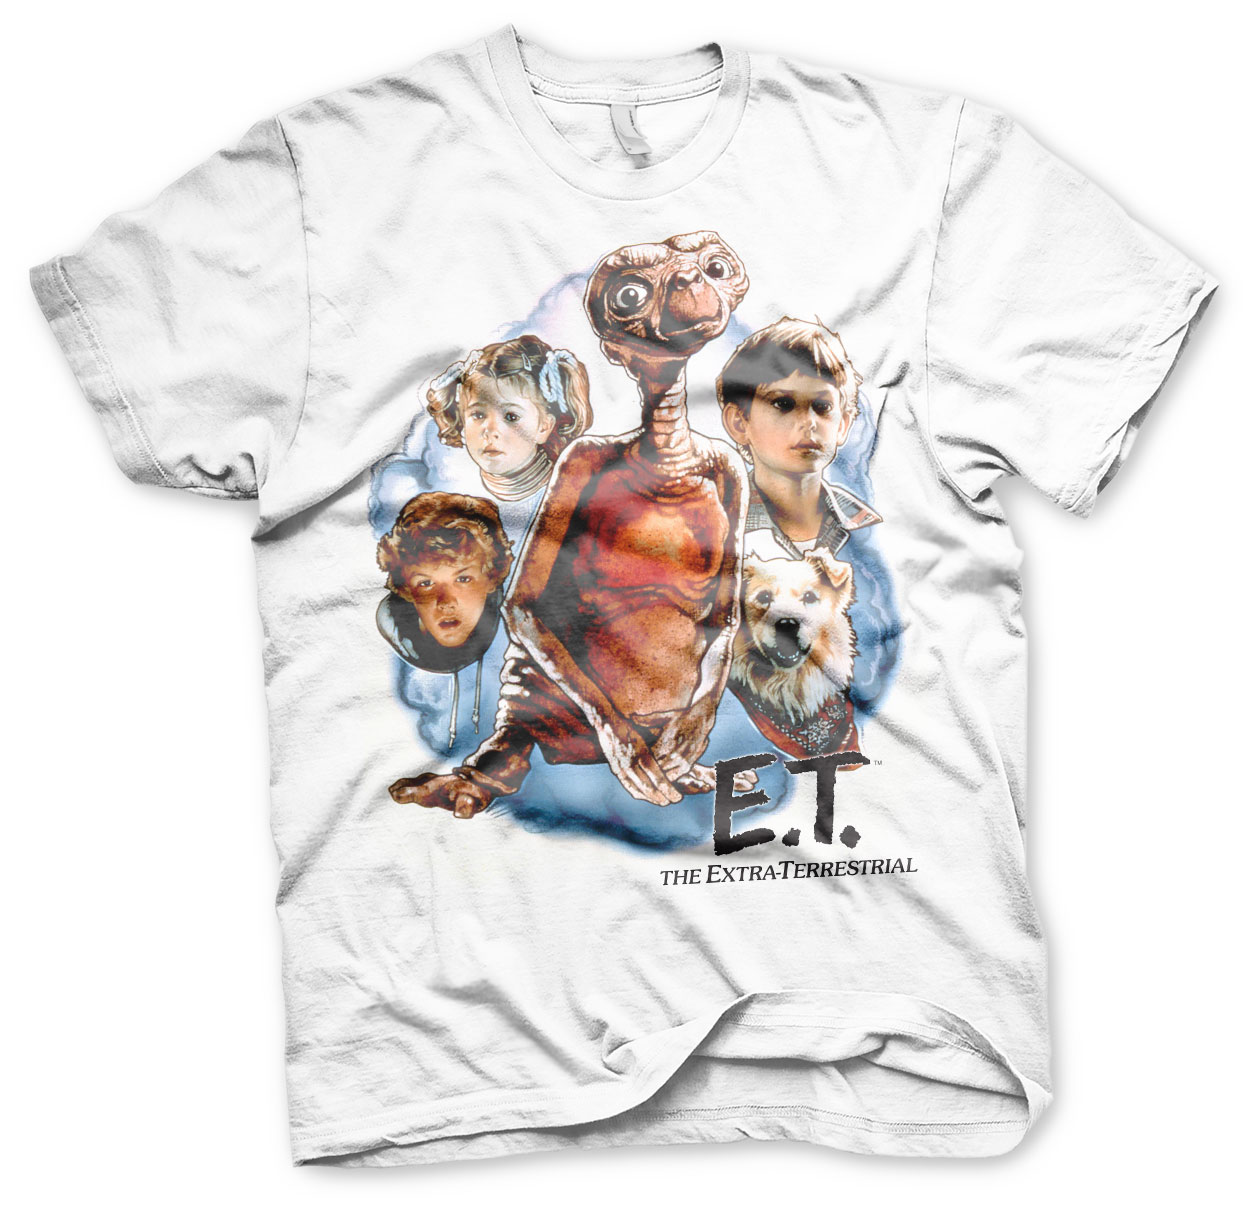 E.T. Retro Poster T-Shirt